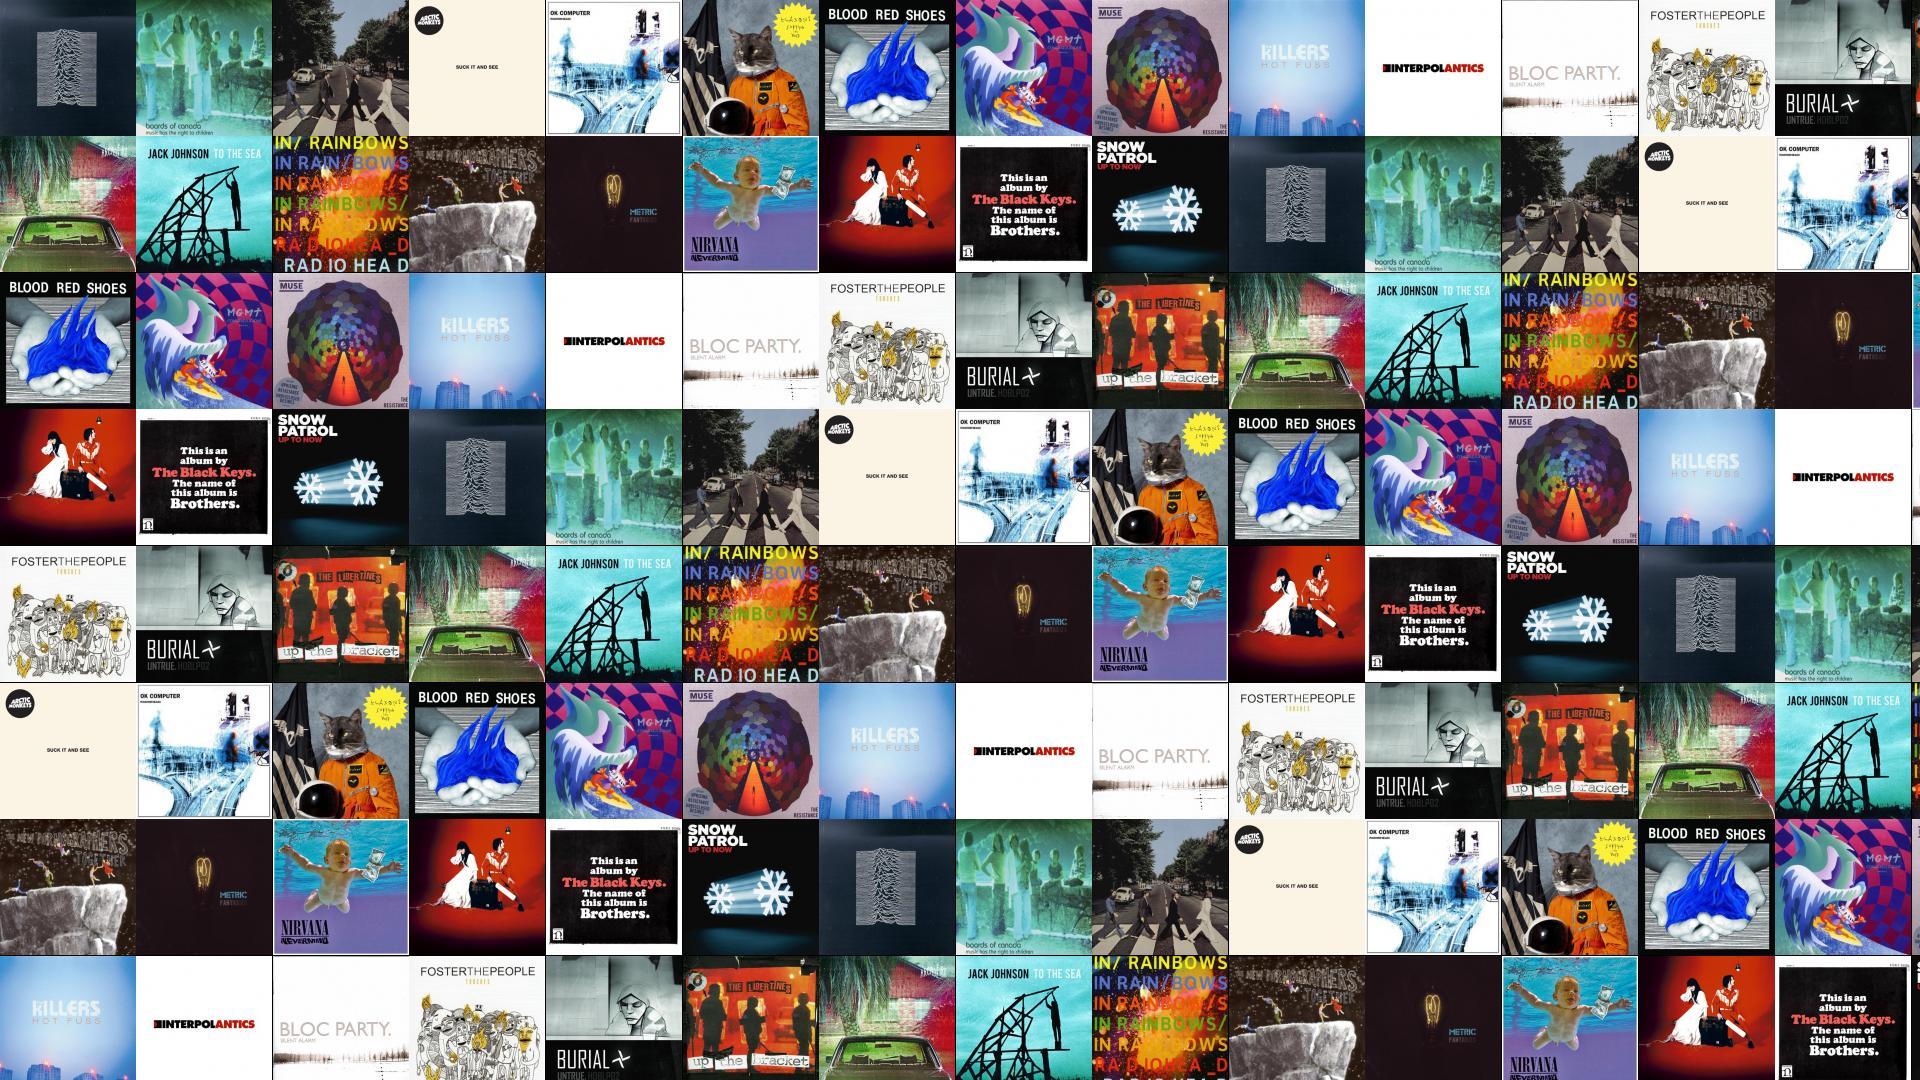 Joy Division Unknown Pleasures Boards Of Canada Music Wallpaper